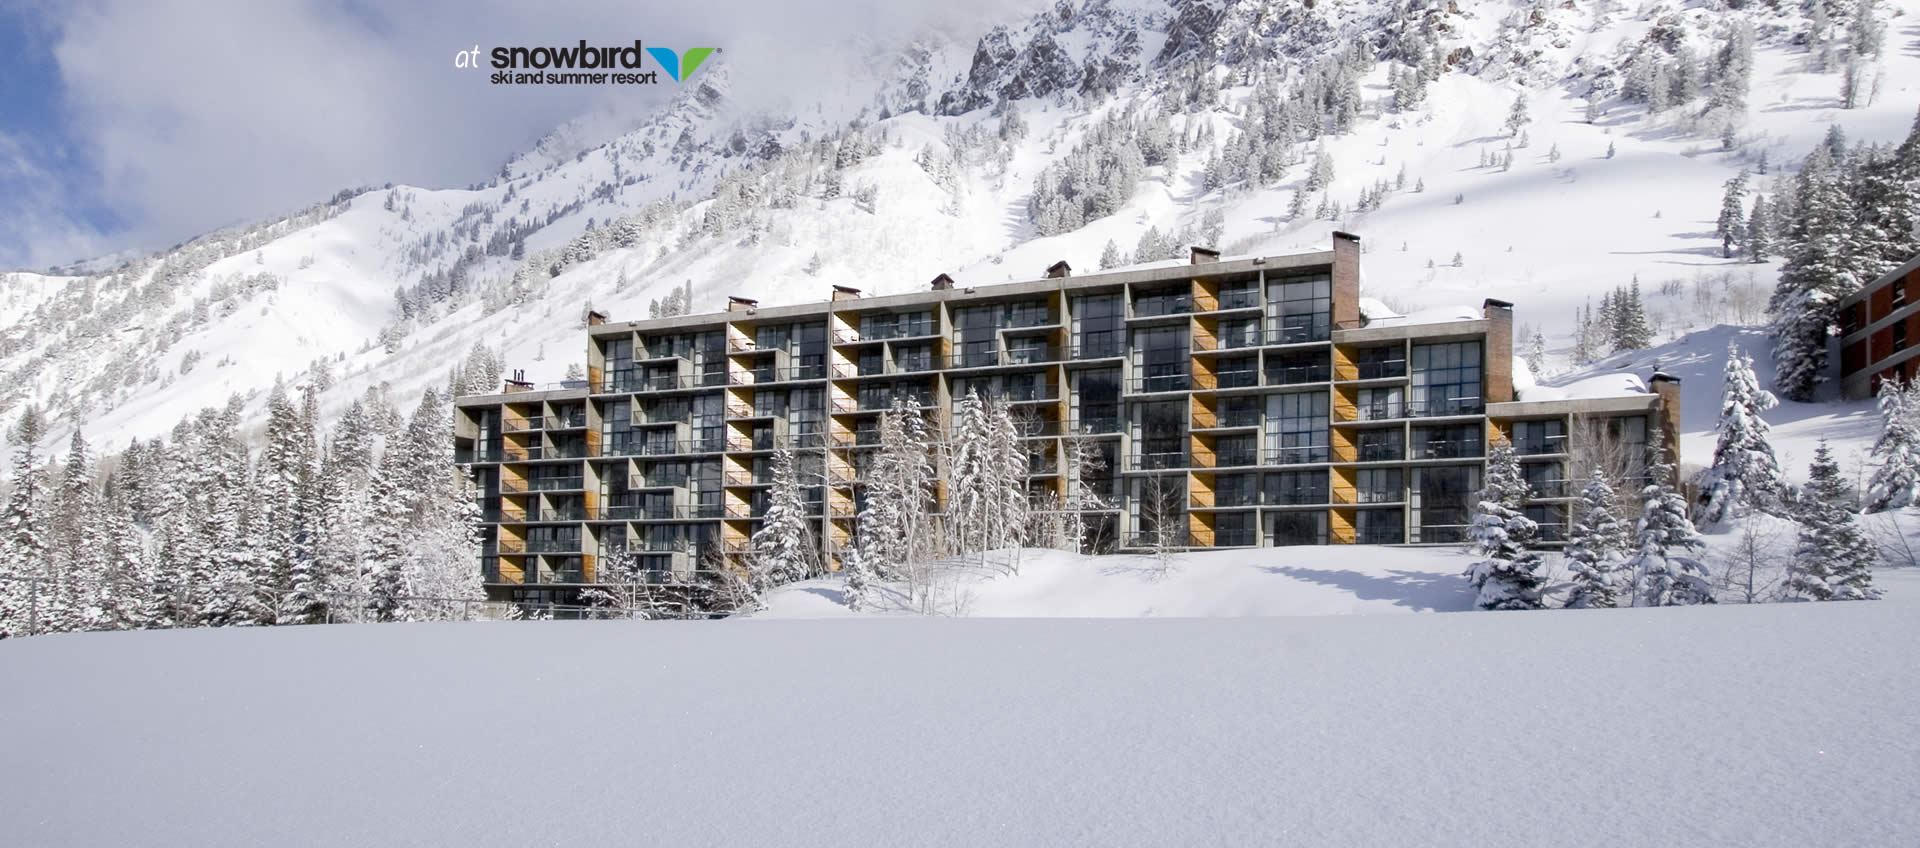 iron blosam lodge | ski-in/ski-out timeshare condominium hotel at